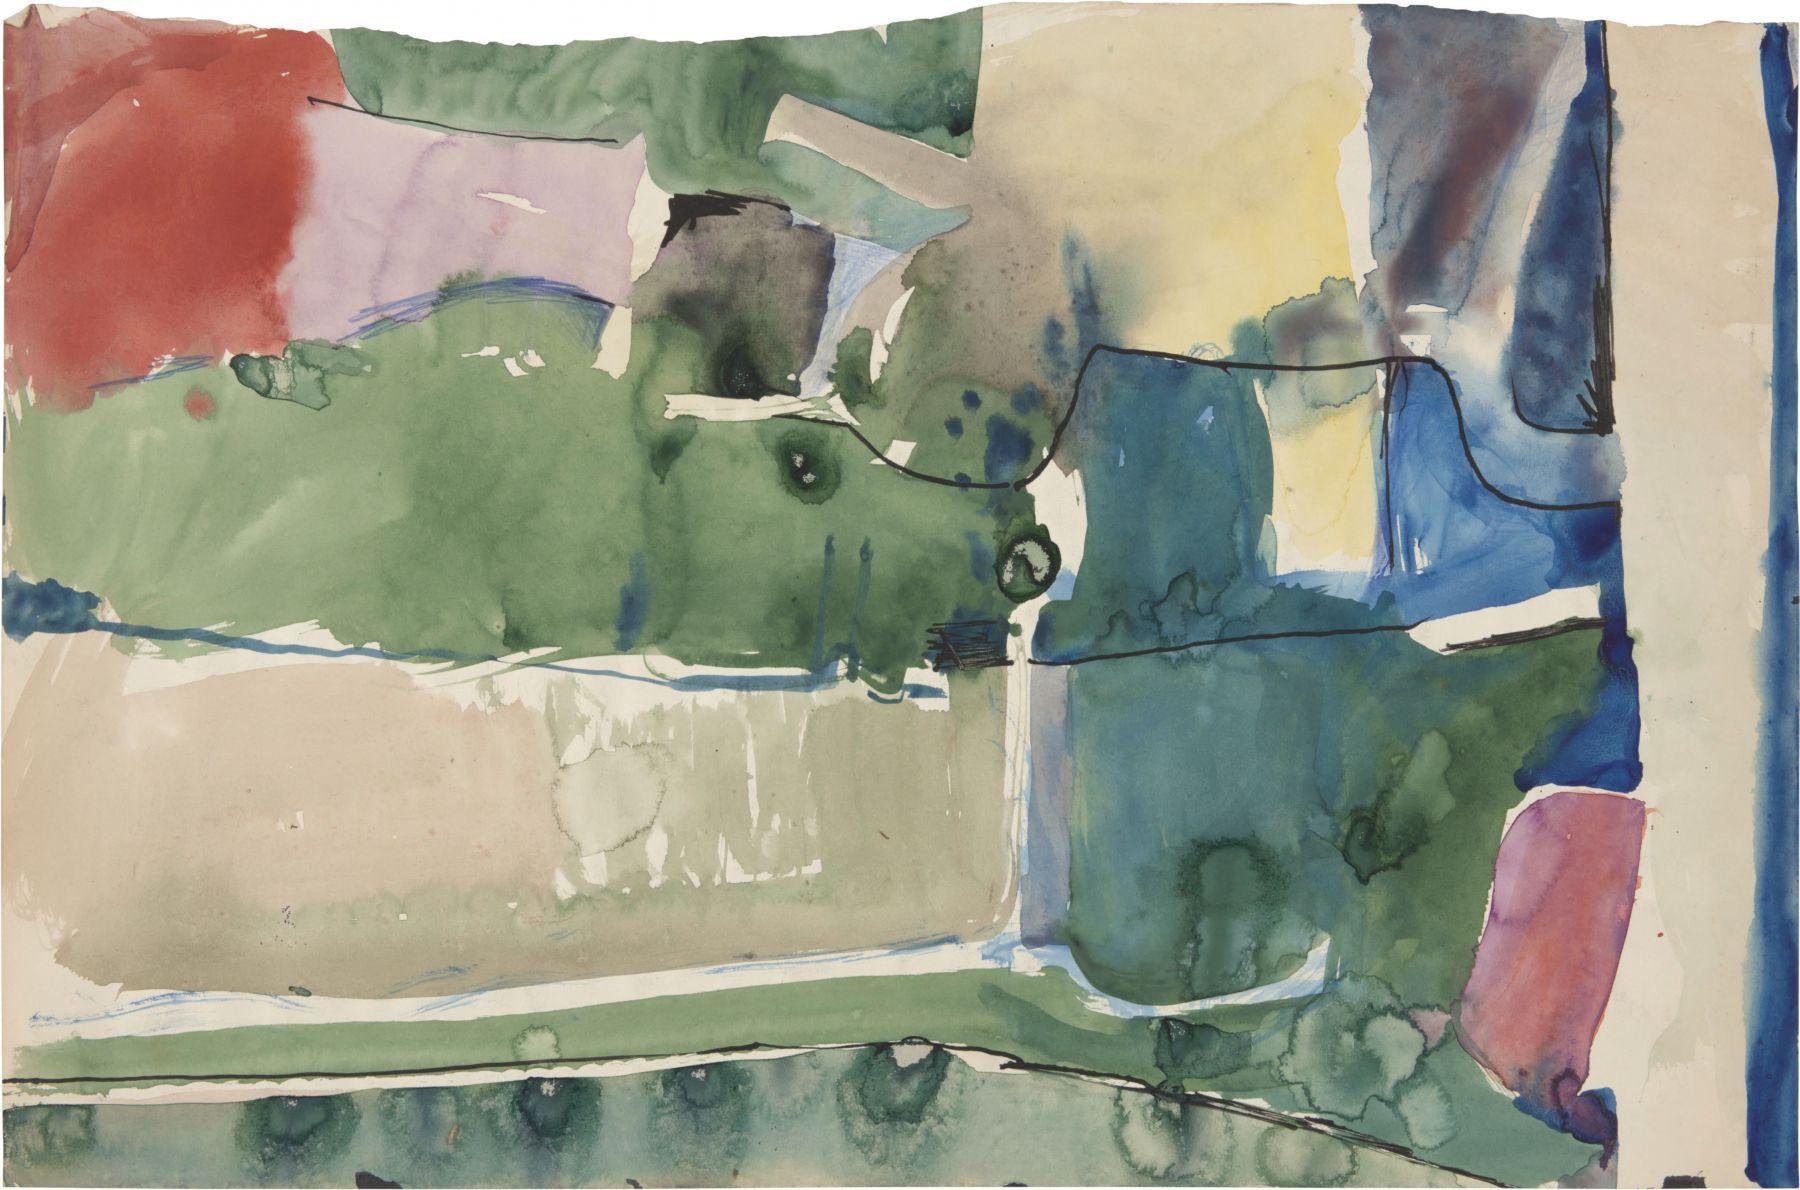 Untitled (CR no. 698), c. 1951-54